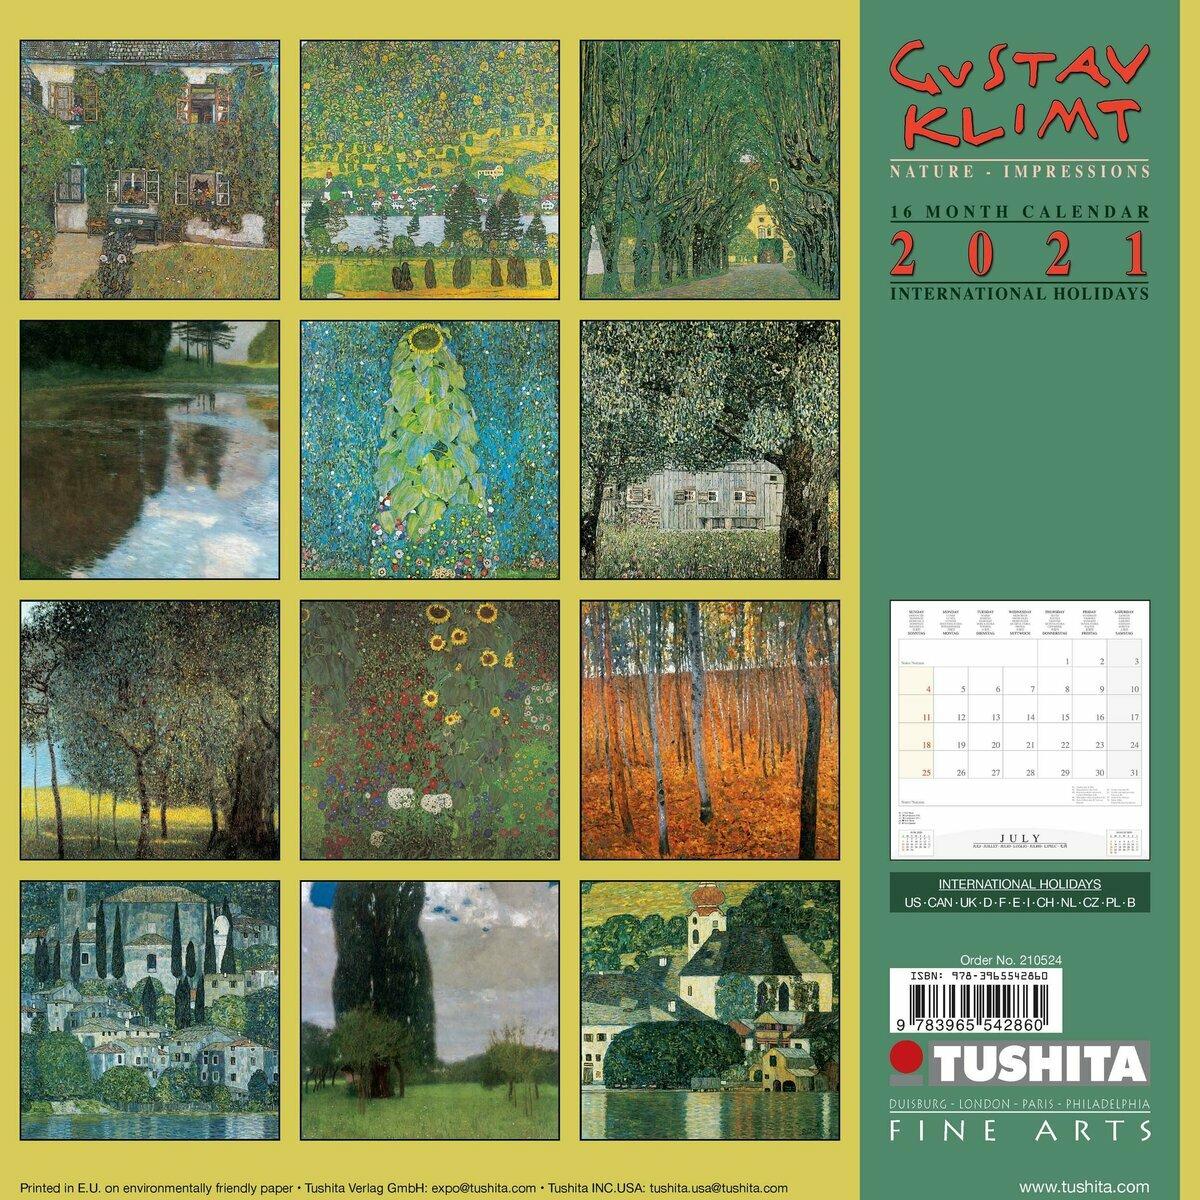 Calendrier 2021 Gustave Klimt nature